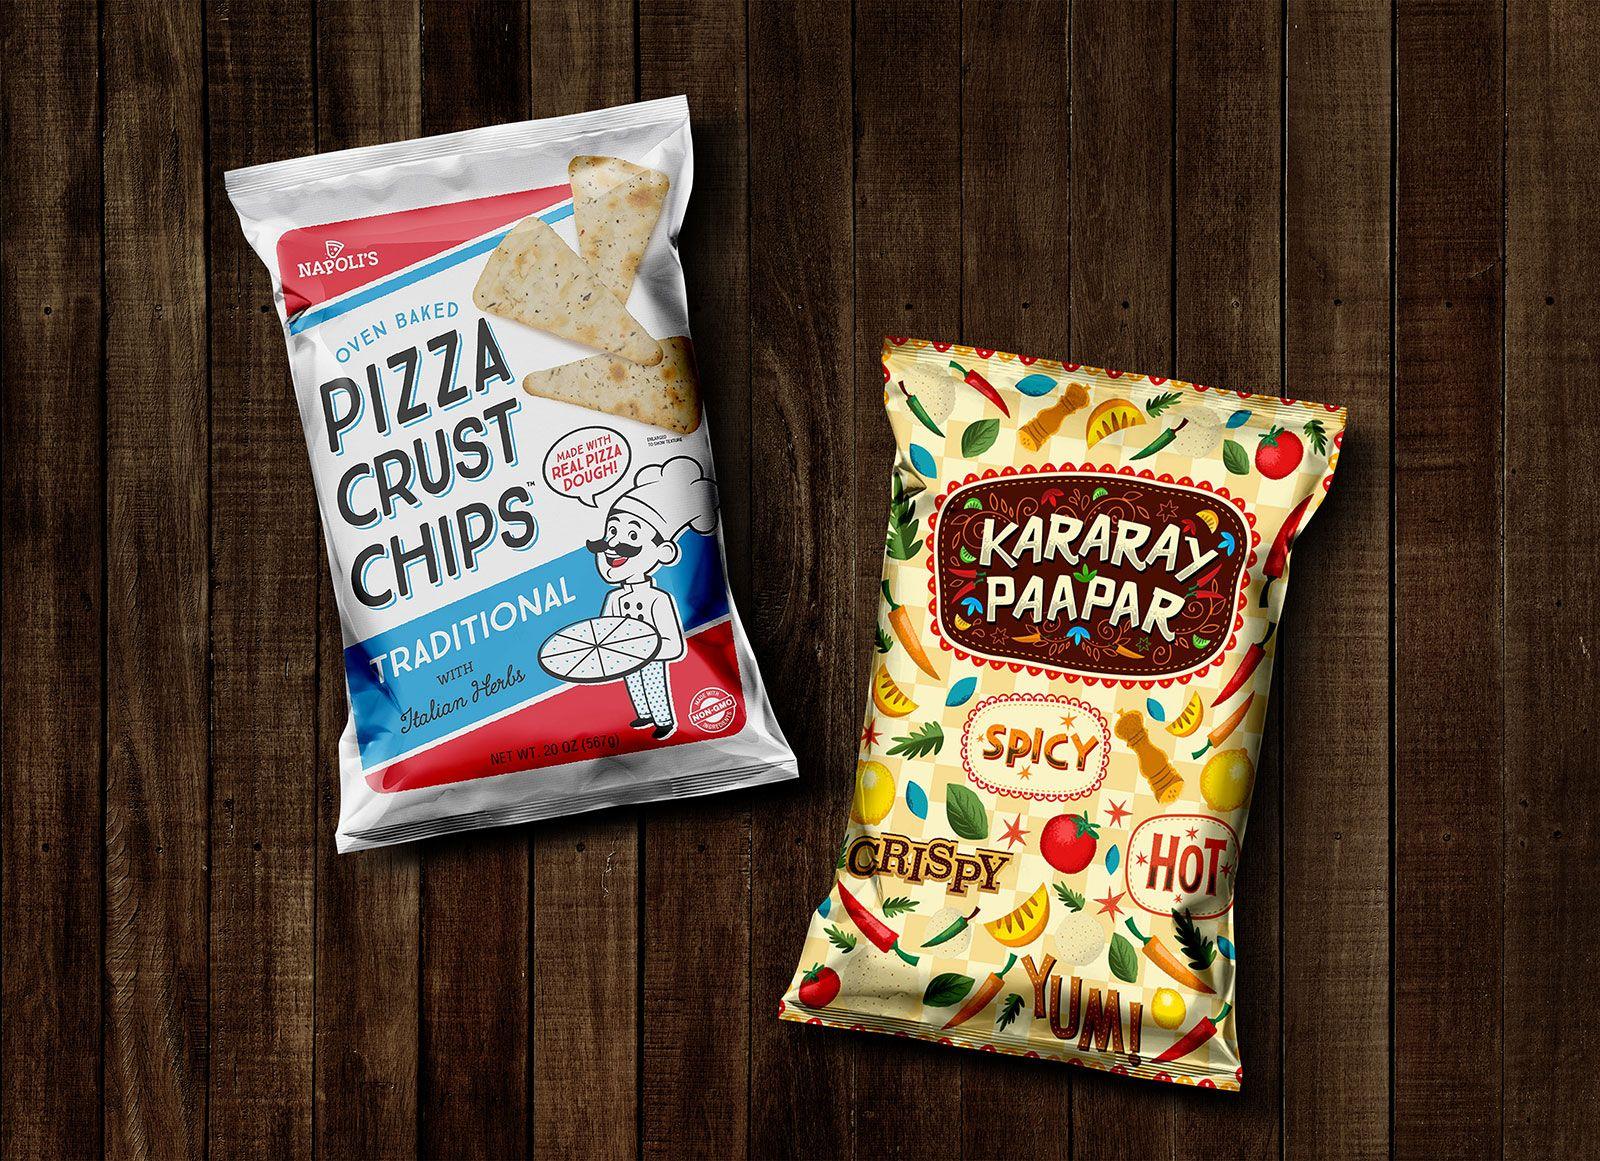 Download Free Snack Pack Chips Pouch Packaging Mockup Psd 1 Desain Produk Saset Desain Logo Bisnis